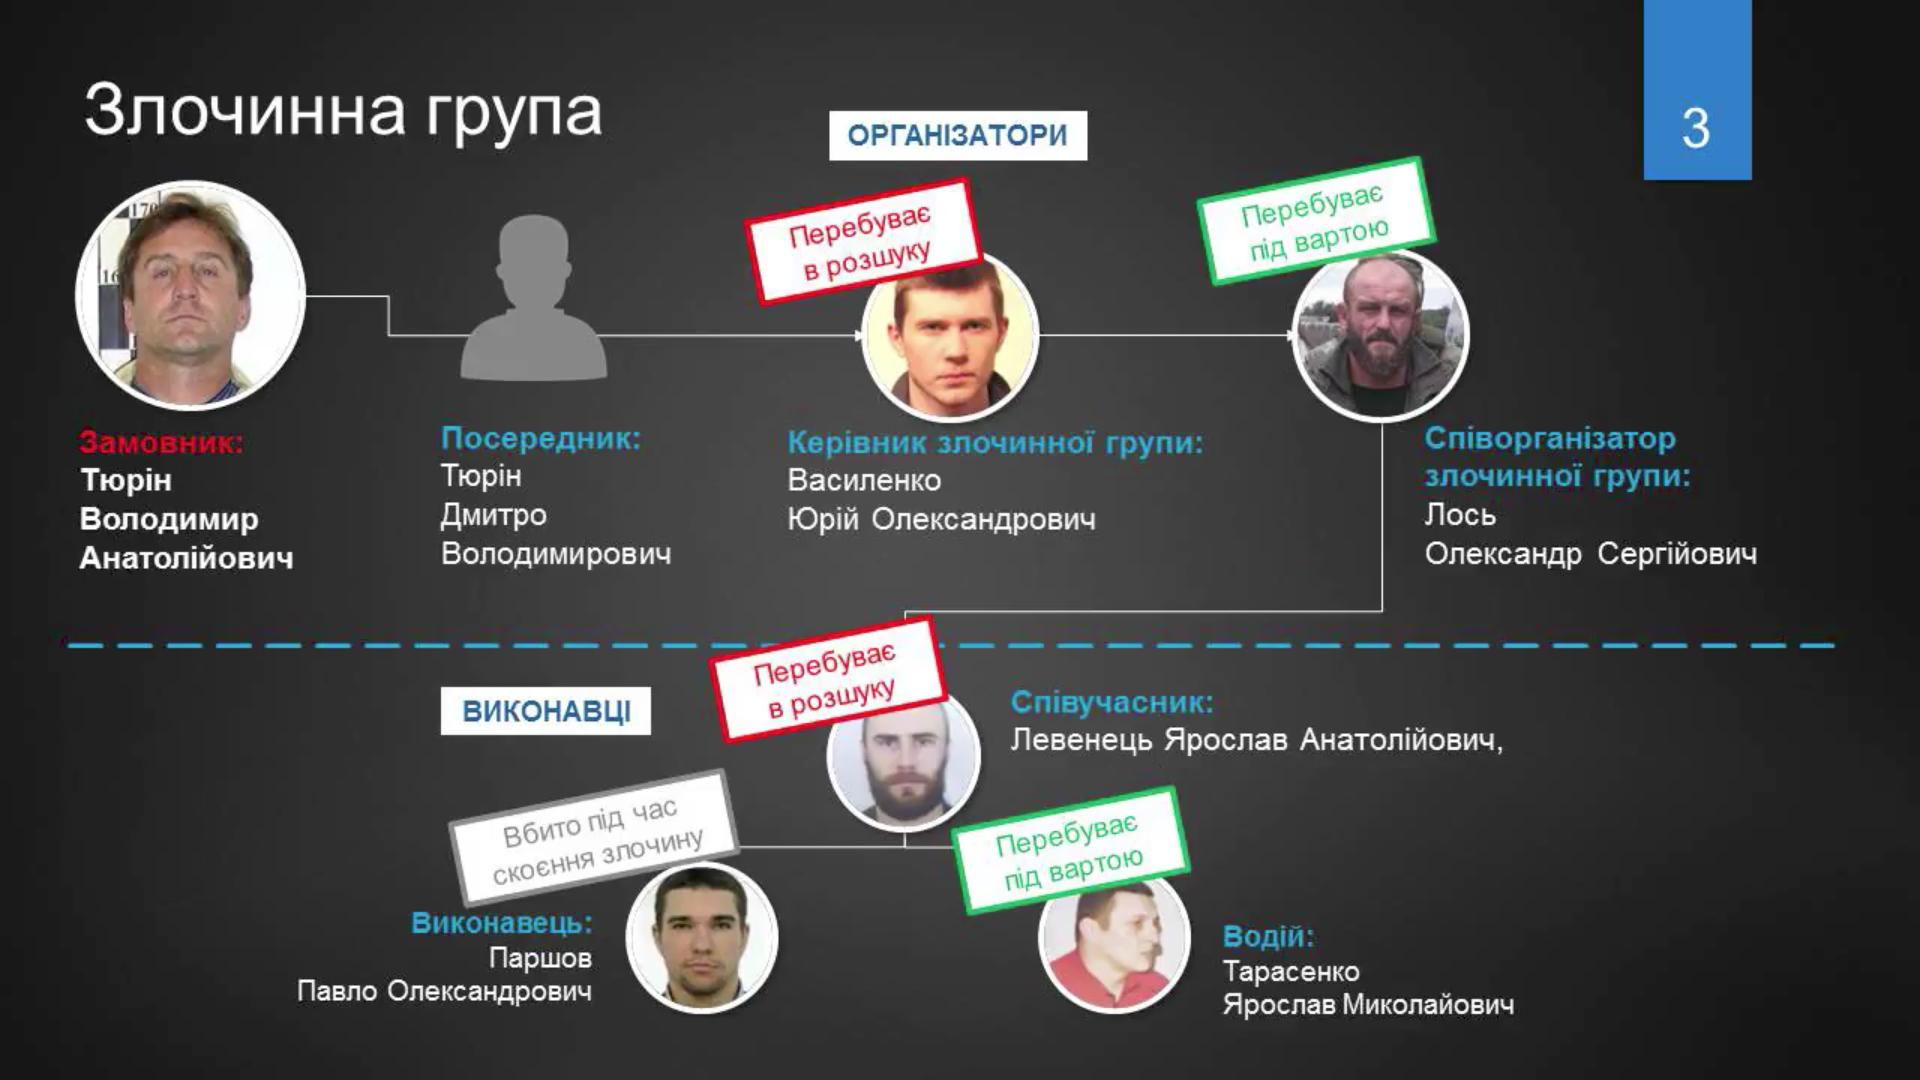 Скриншот: Генеральна прокуратура Україна / YouTube